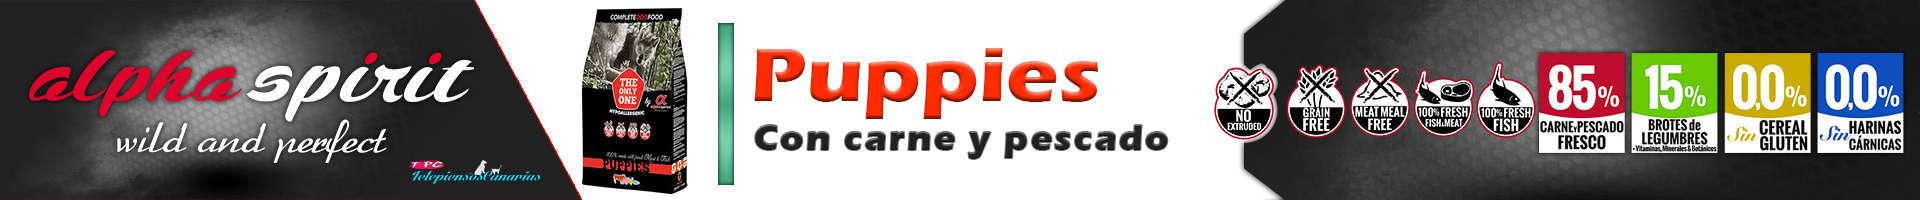 Alpha Spirit alimento puppies, pienso con pavo 35%